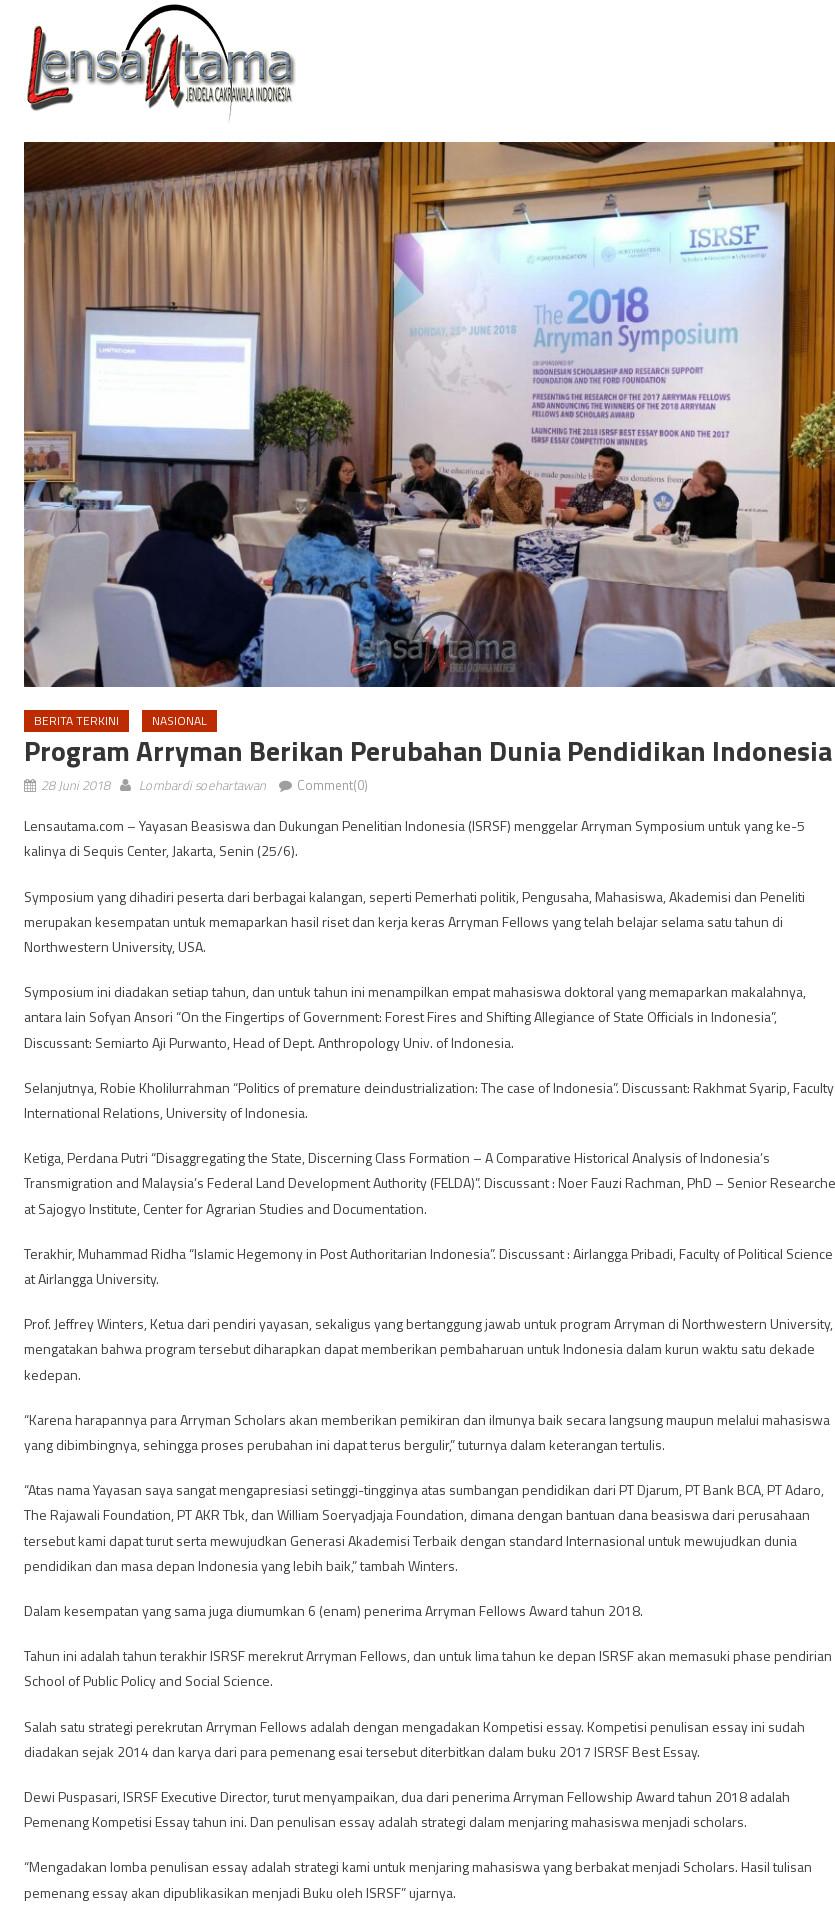 Program Arryman Berikan Perubahan Dunia Pendidikan Indonesia